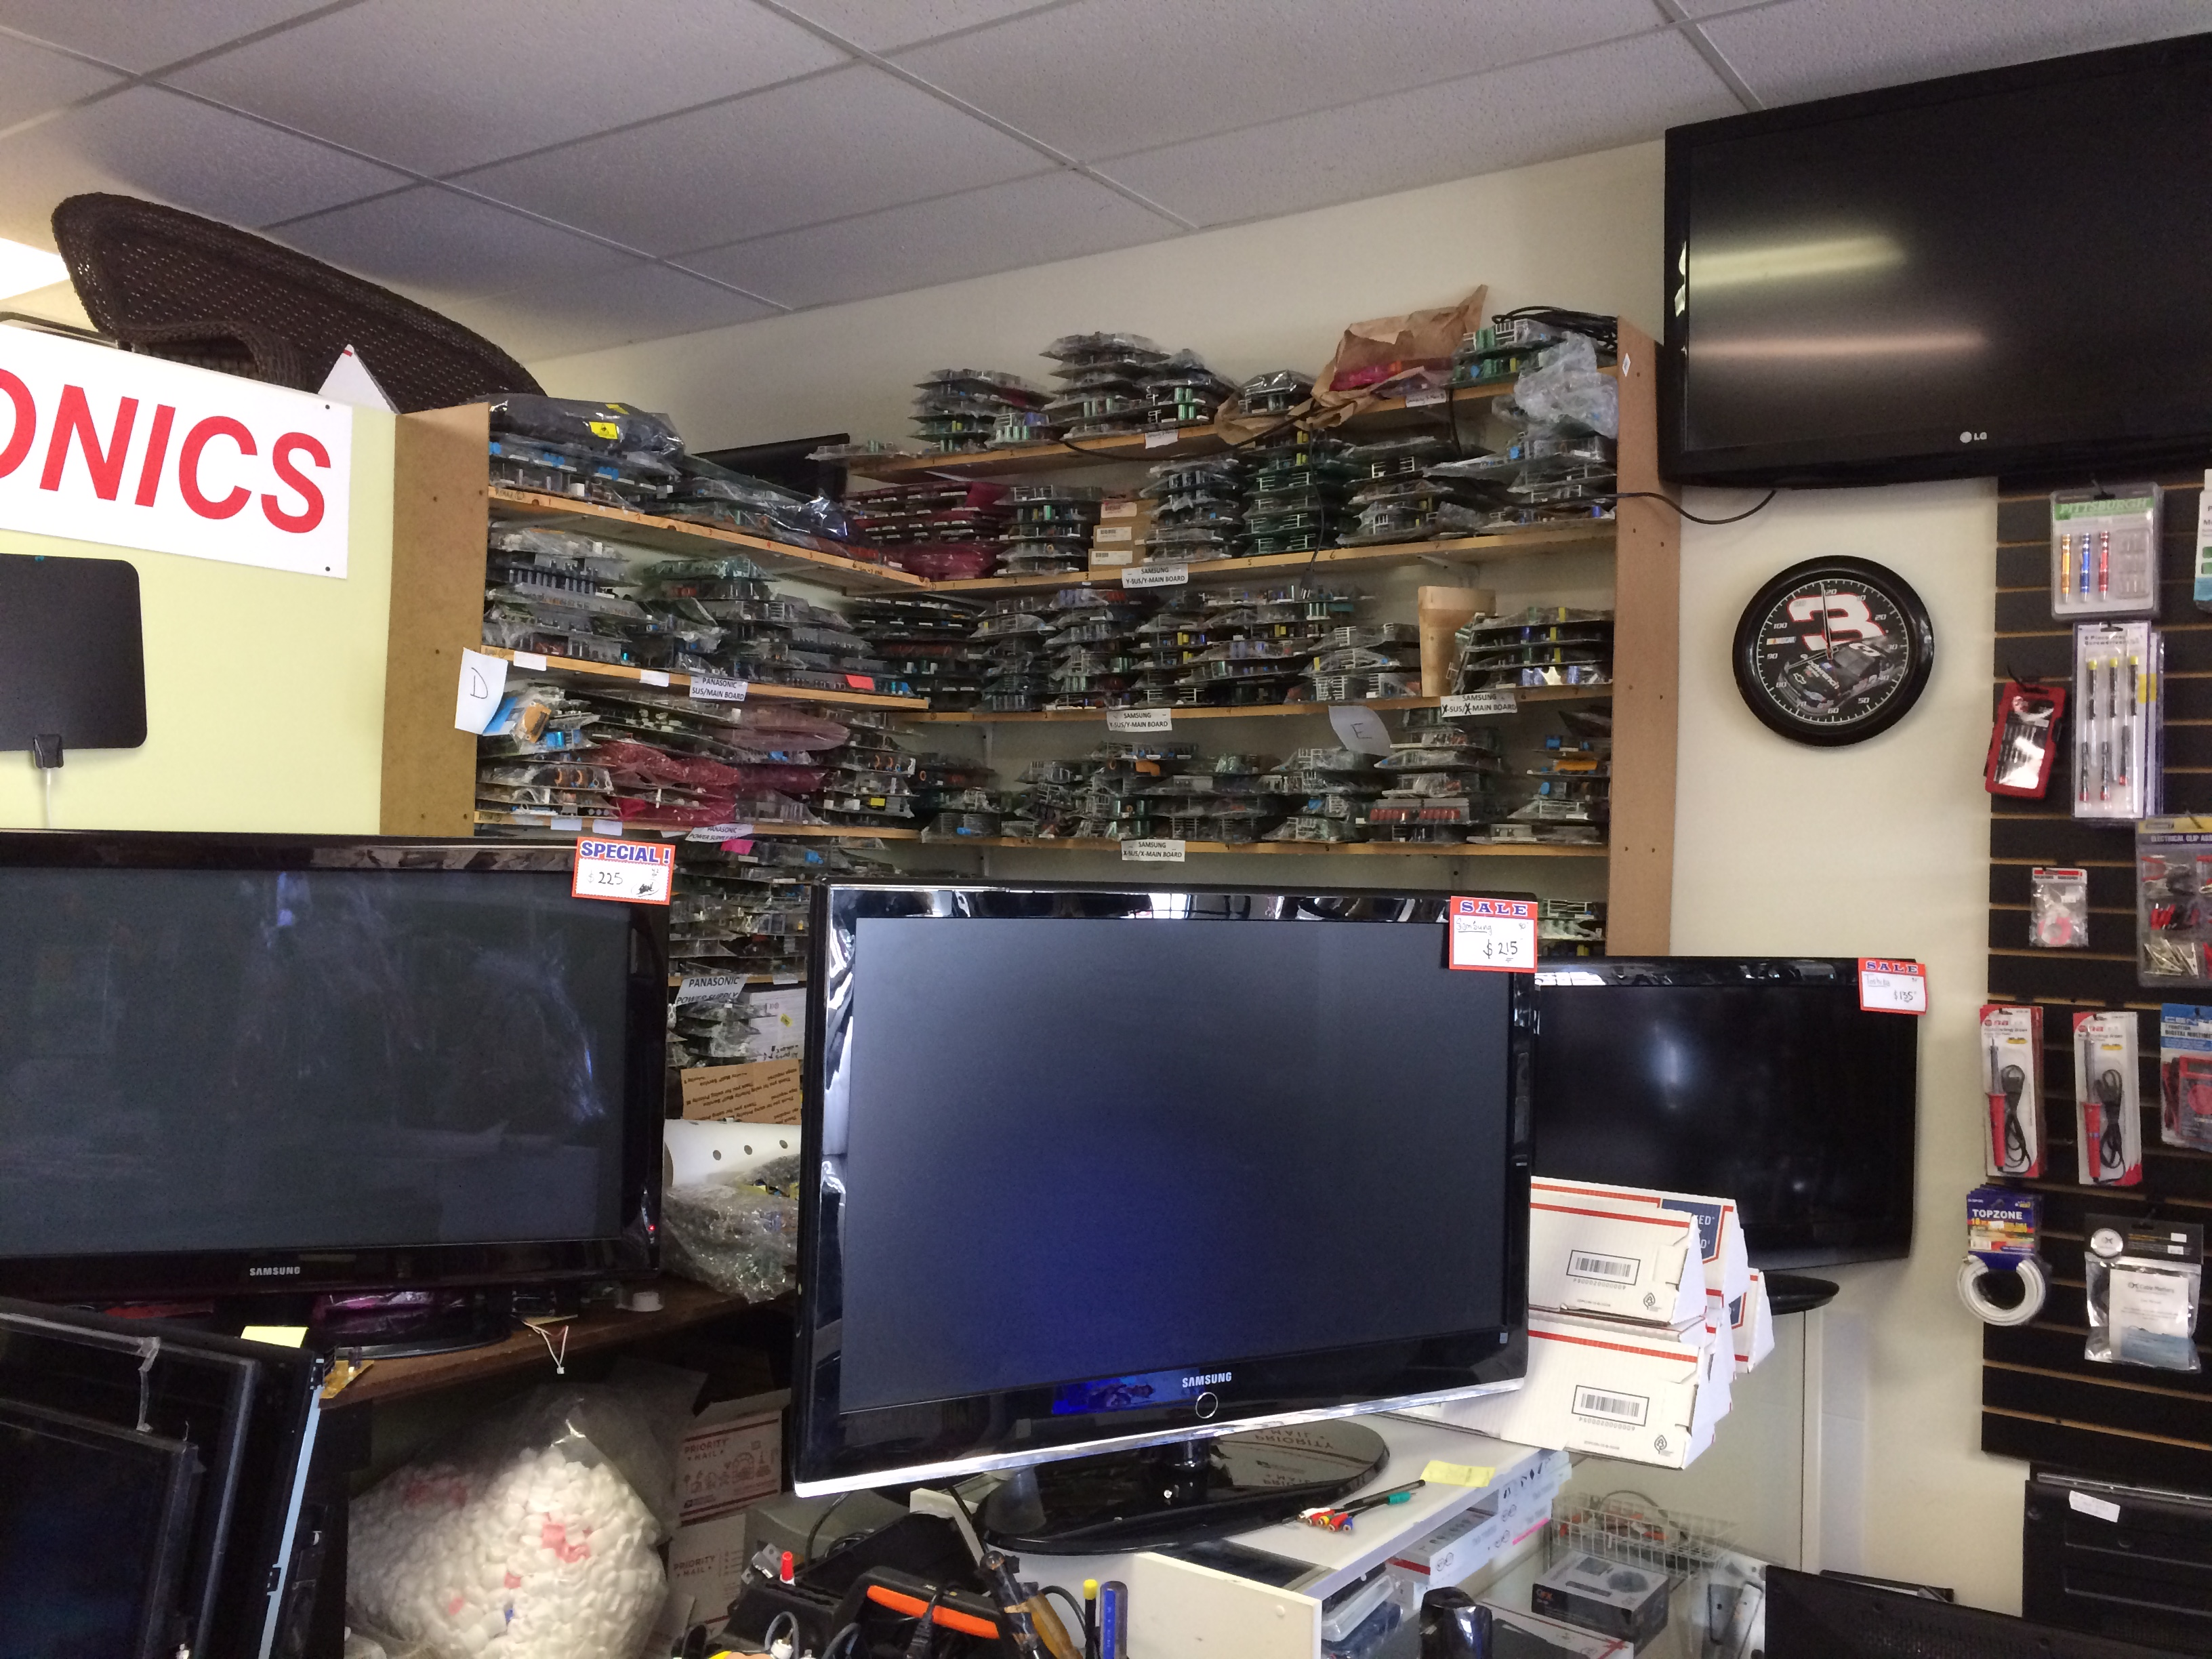 TORRES ELECTRONICS TV REPAIR AND PARTS 5716 Bellaire Blvd Ste. D2 Houston,  TX Electronics Repair - MapQuest